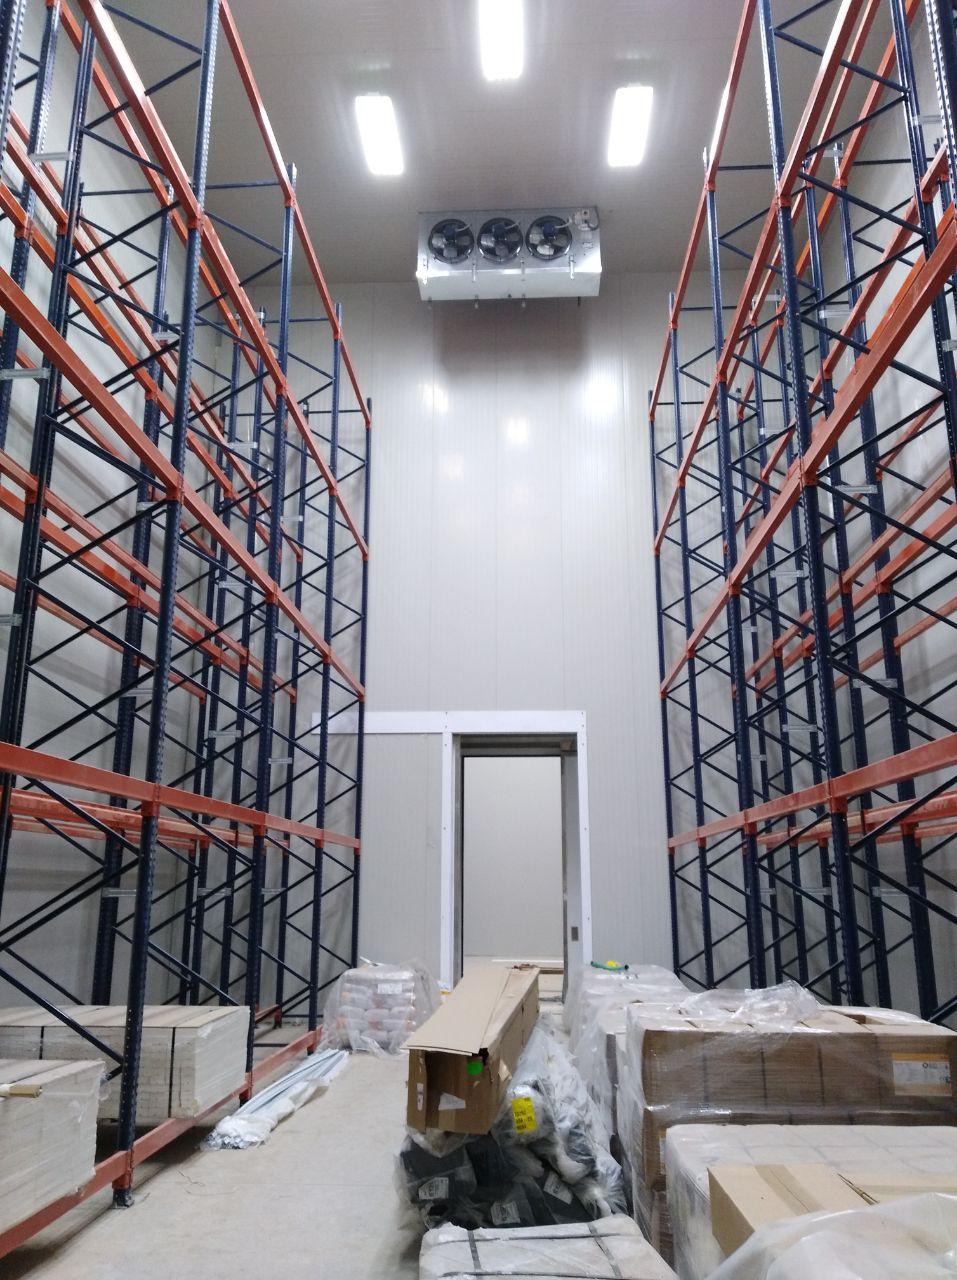 industrial refrigeration processes